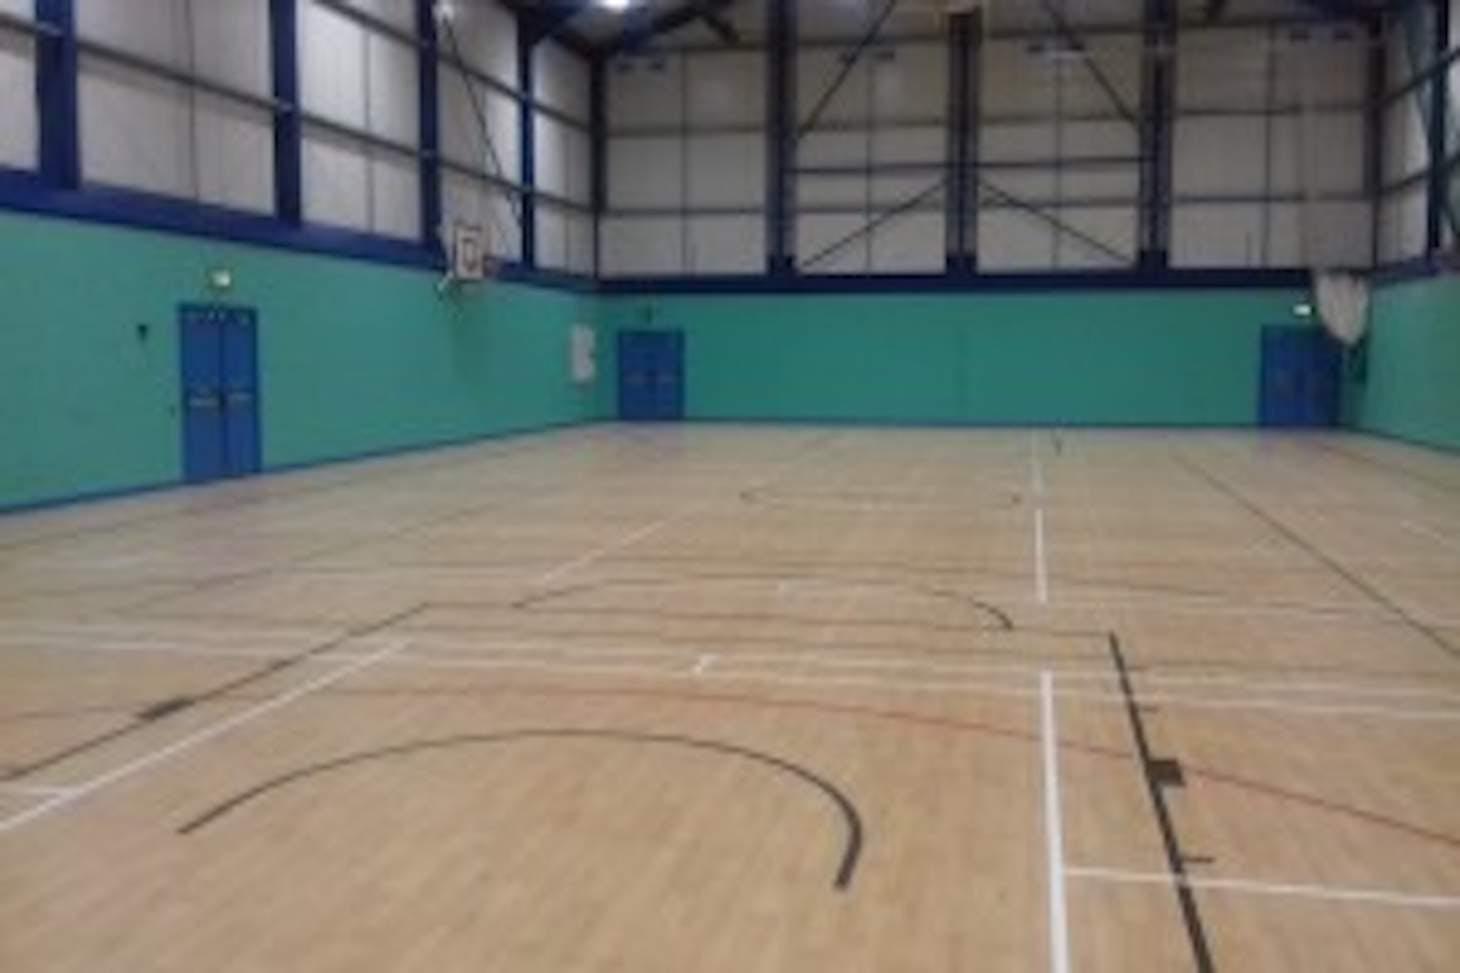 Manchester Enterprise Academy Wythenshawe Nets | Sports hall cricket facilities